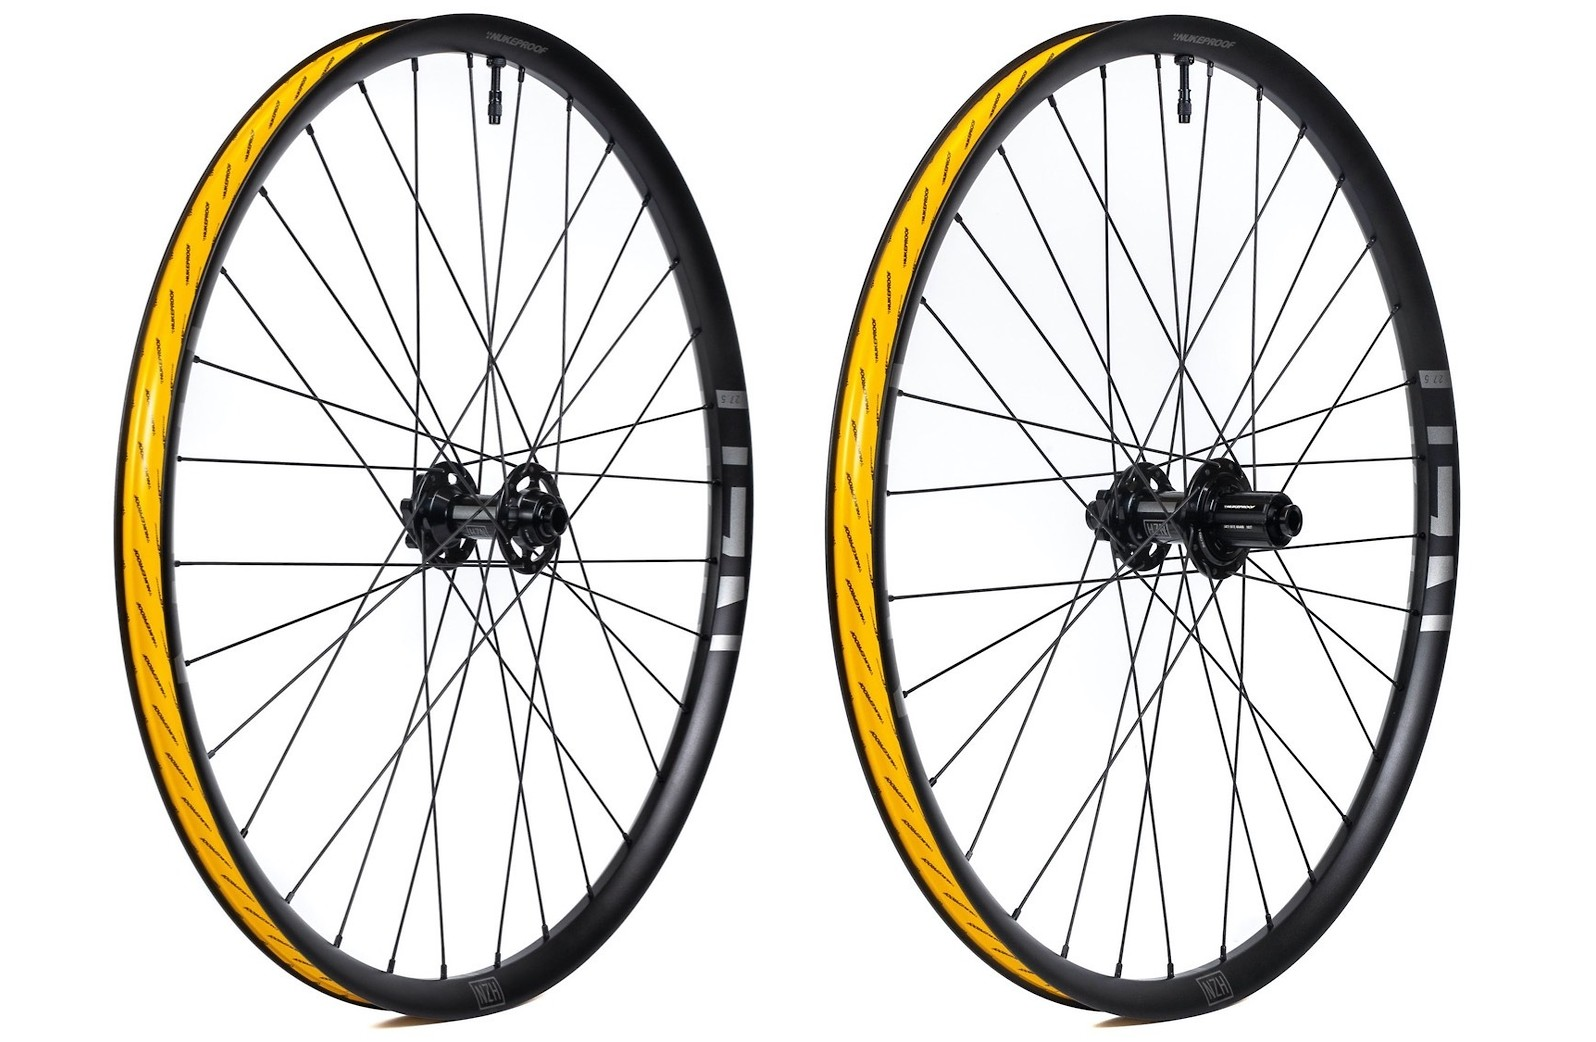 Nukeproof Horizon v2 wheels